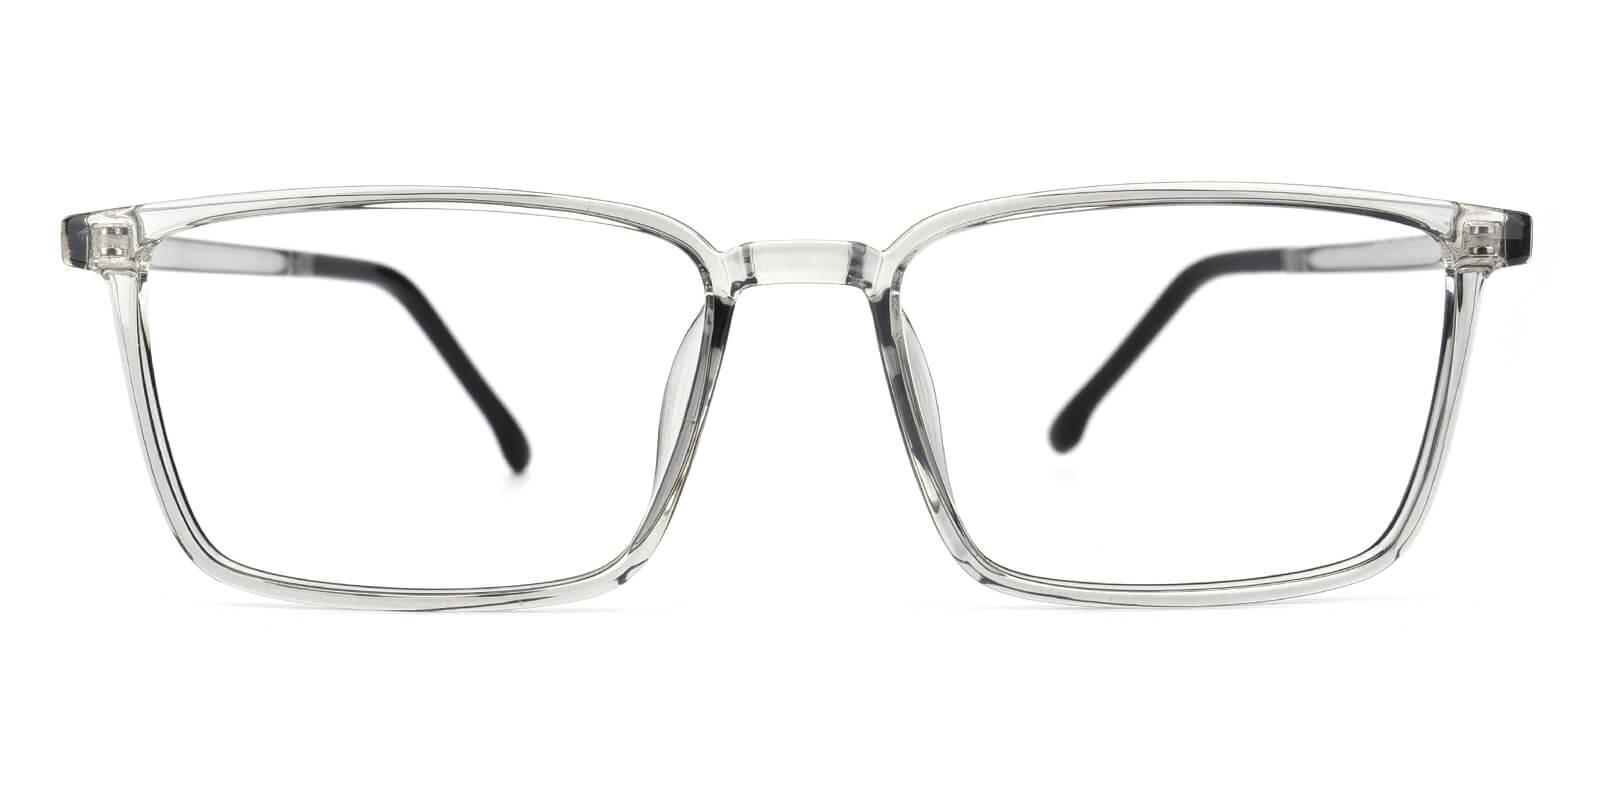 Corvallis-Gray-Rectangle-TR-Eyeglasses-detail